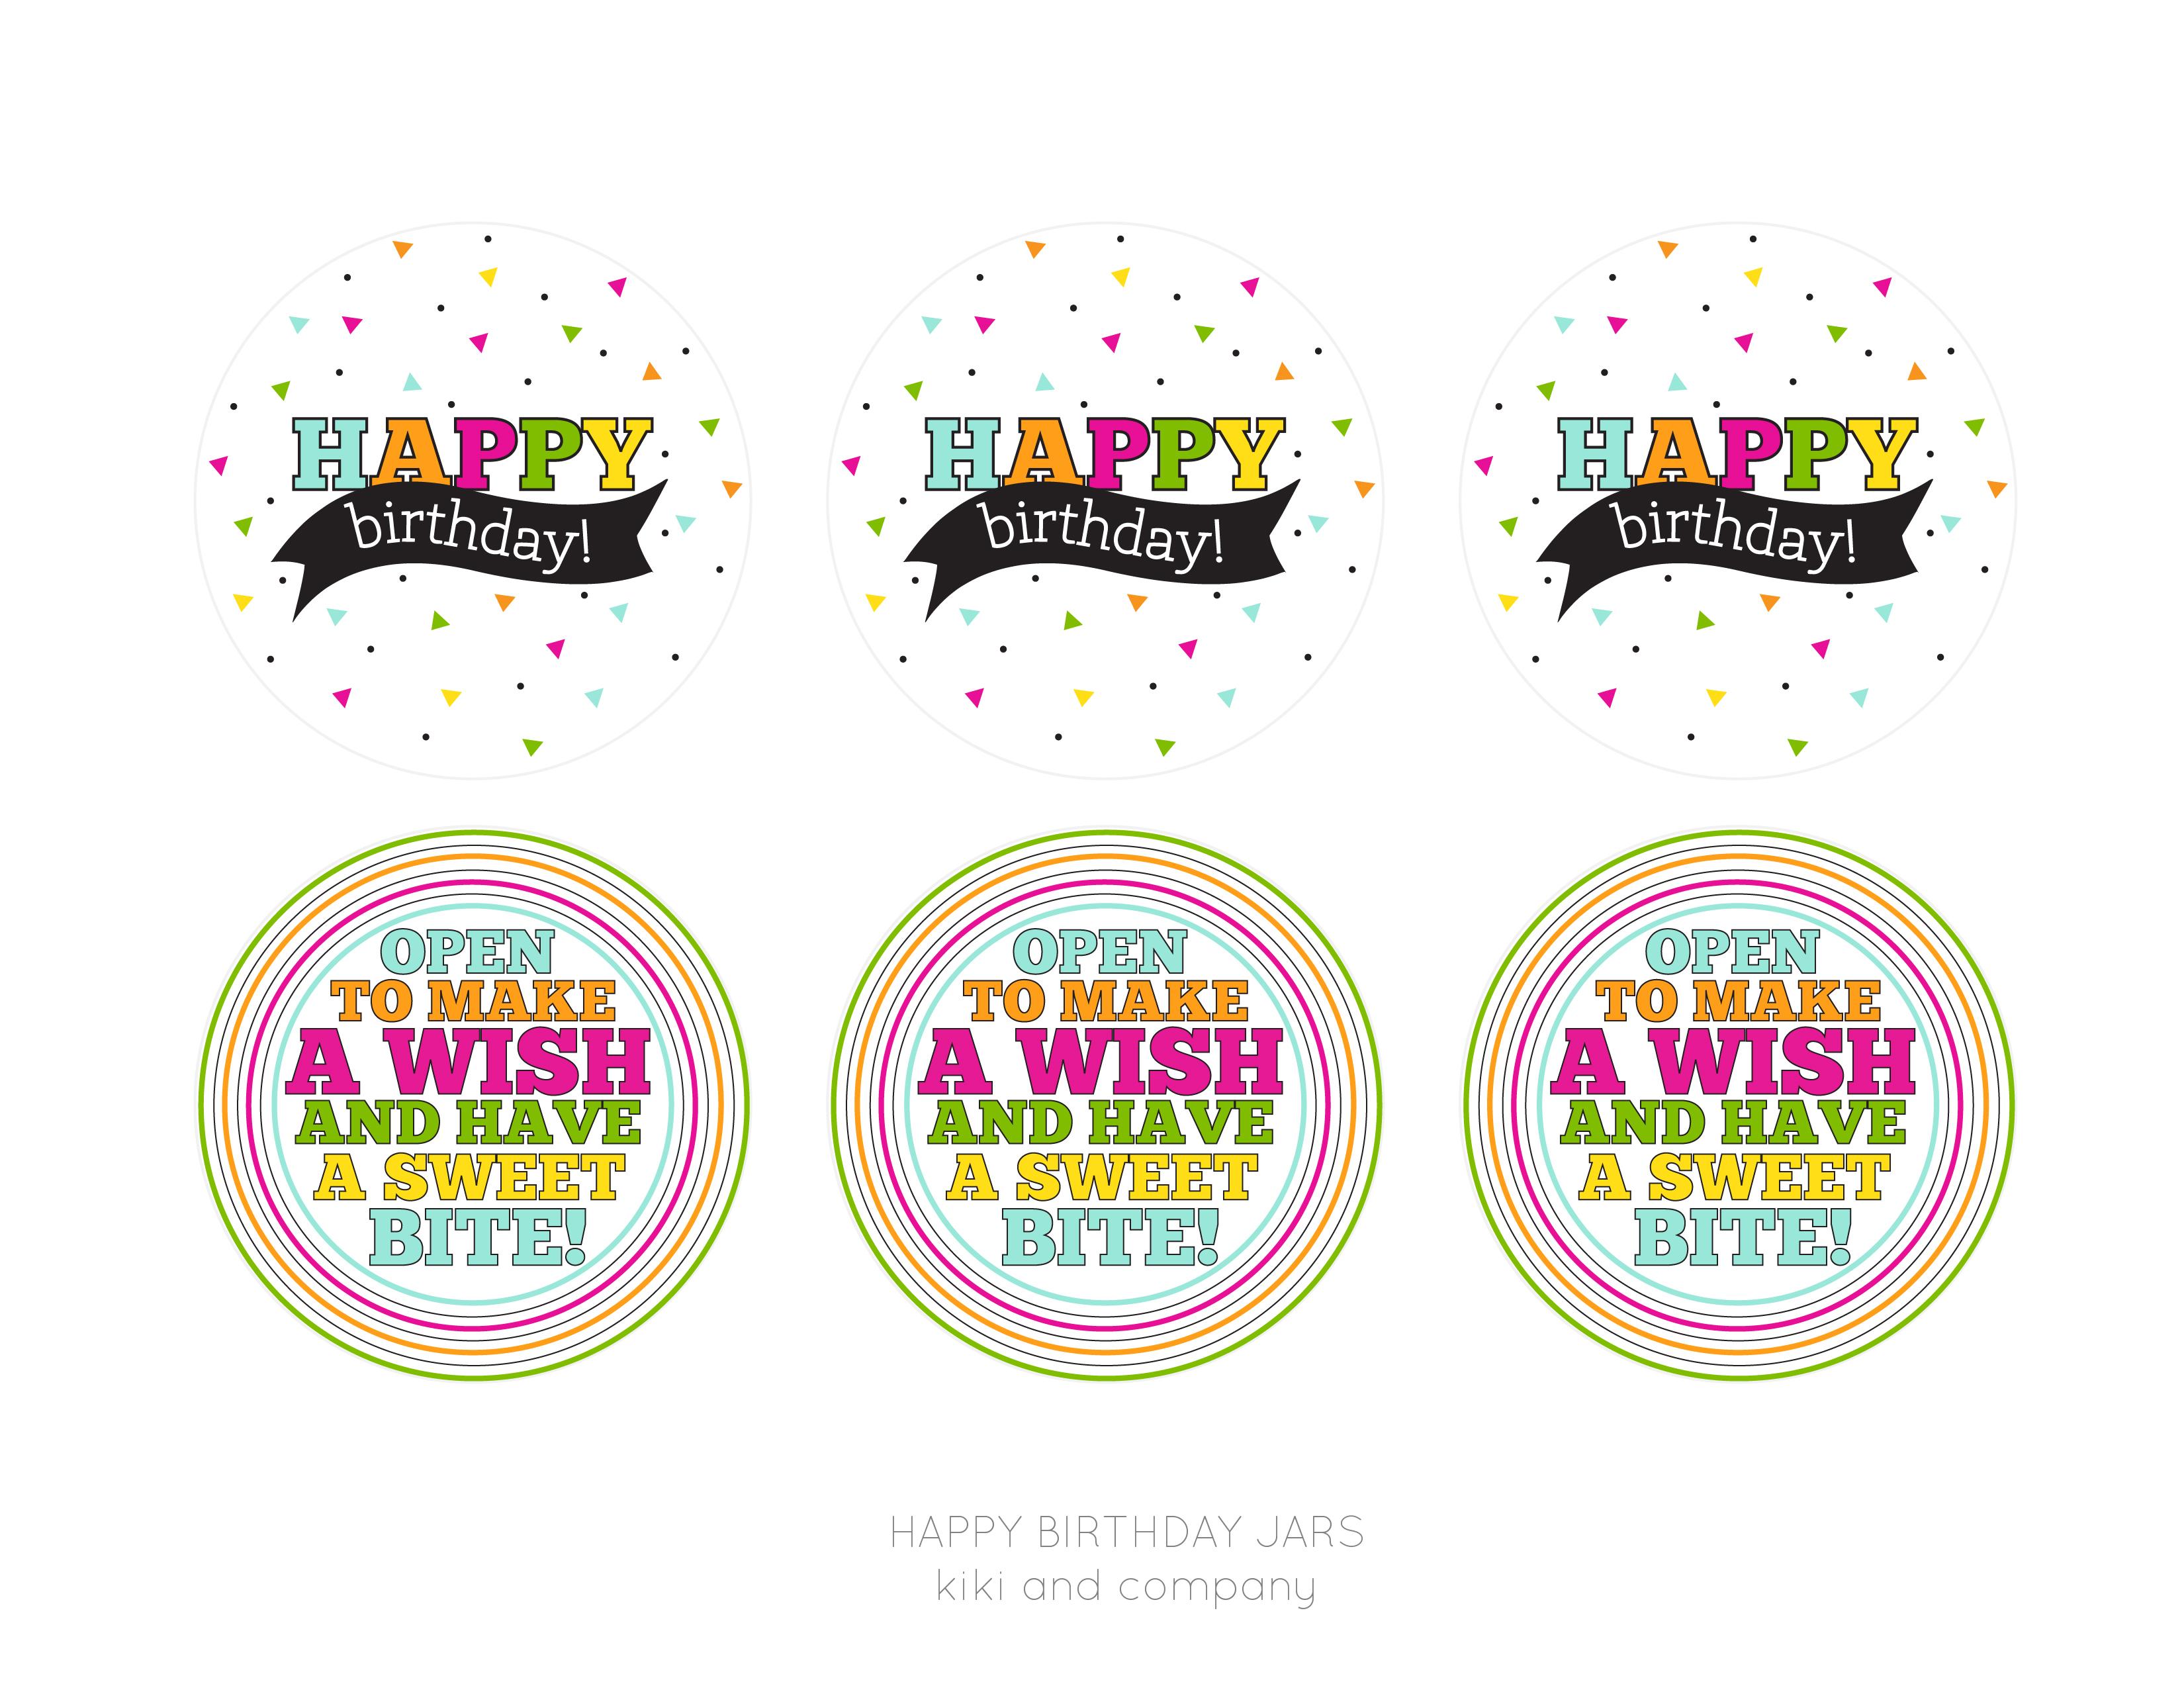 Happy Birthday Jar {Free Printable} - Kiki & Company - Happy Birthday Free Printable